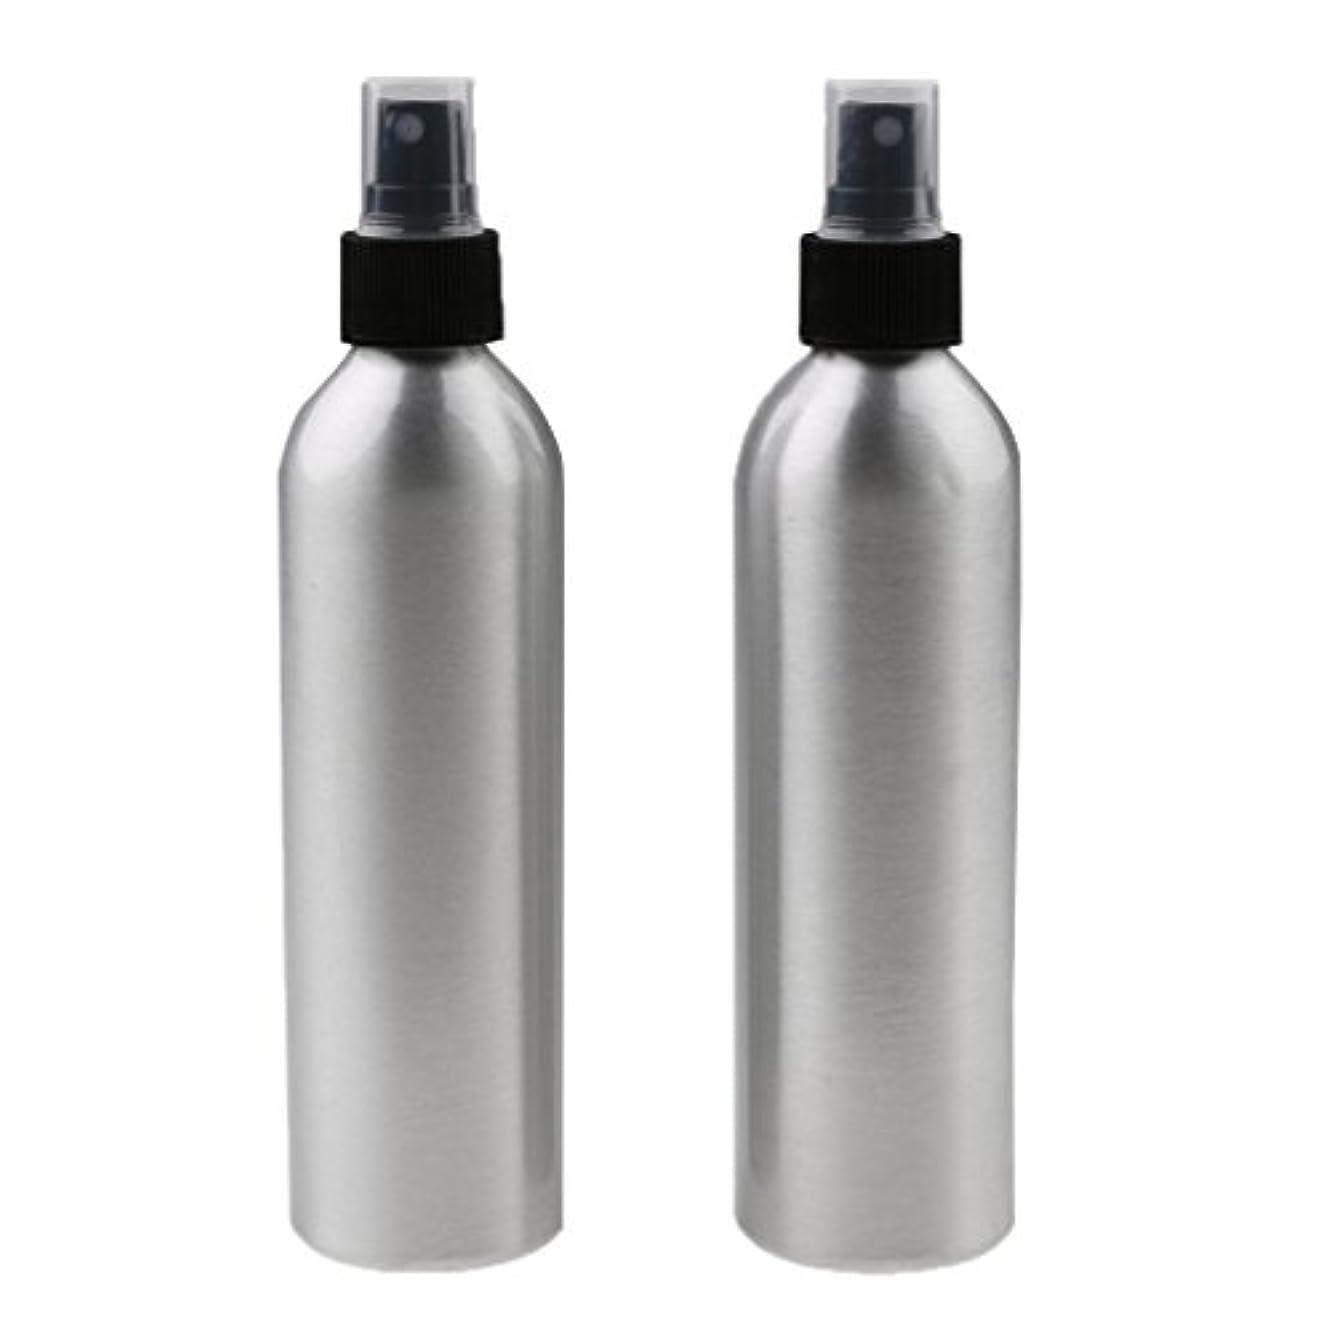 Kesoto 2個入り 旅行 アルミ ミスト スプレー 香水ボトル メイクアップ スプレー アトマイザー 女性用 美容 小物 軽量 持ち運び便利 全4サイズ - 100ml